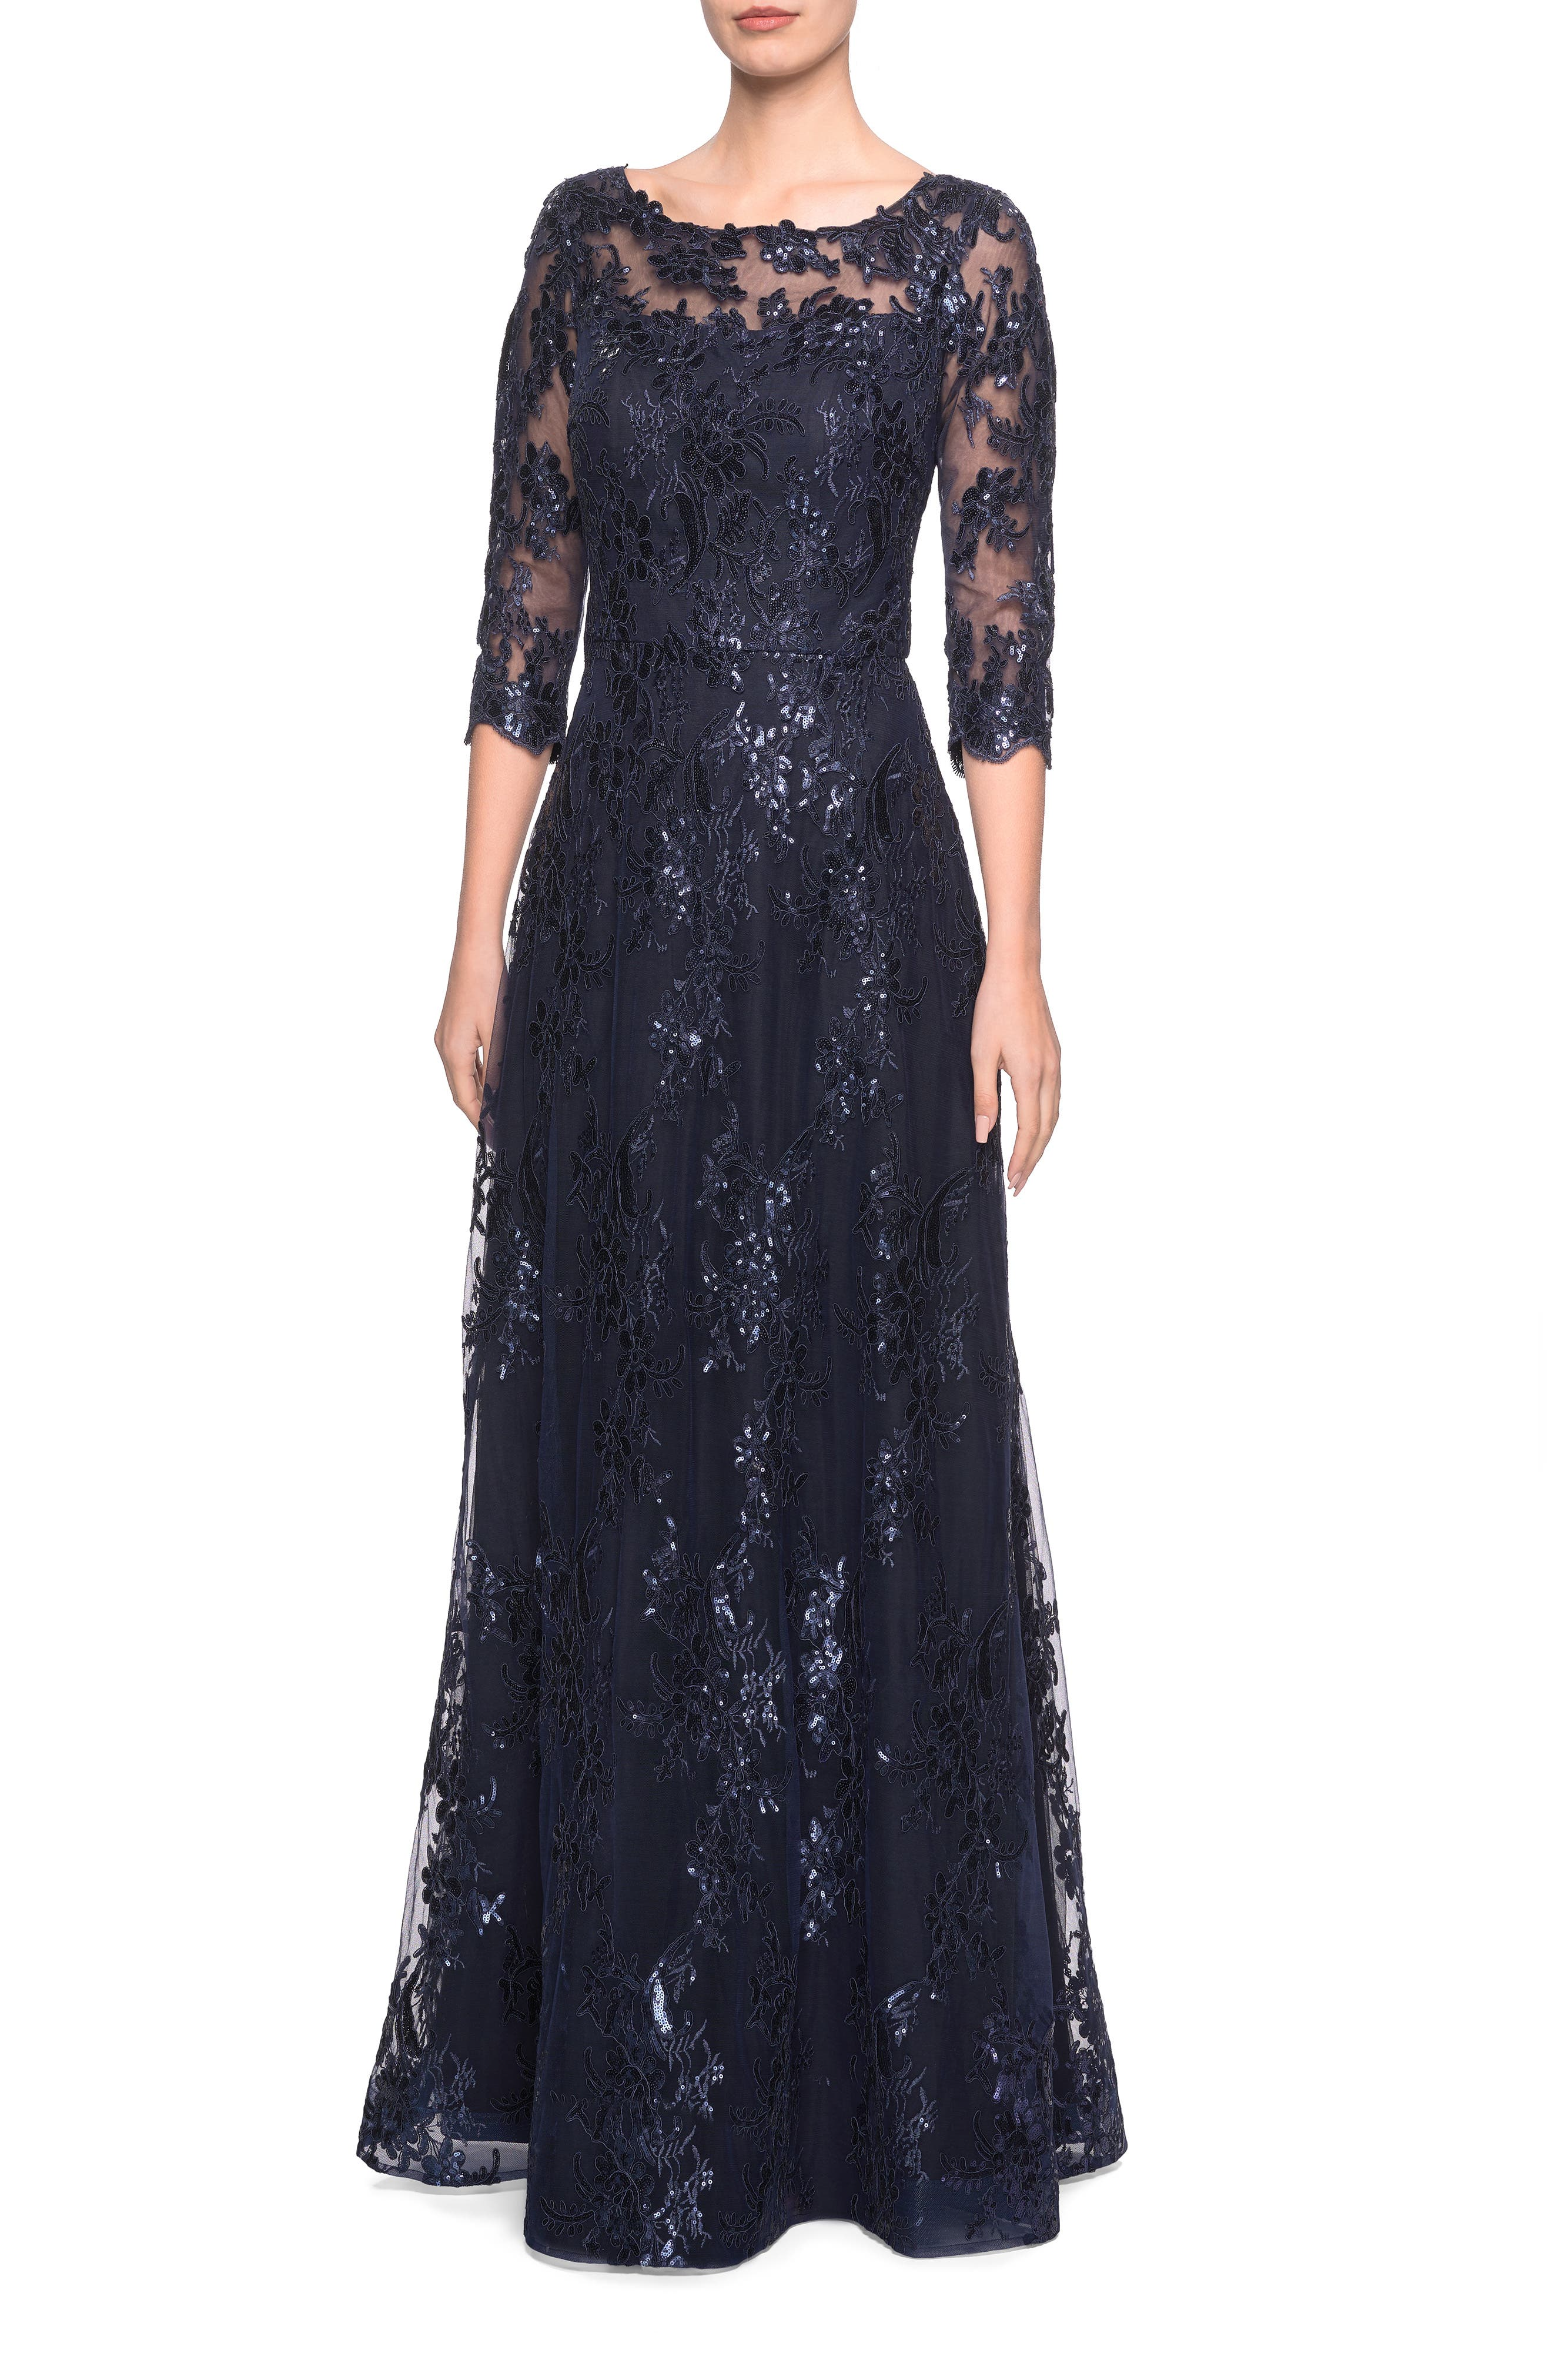 La Femme Shimmer Sequin Lace Evening Dress, Blue